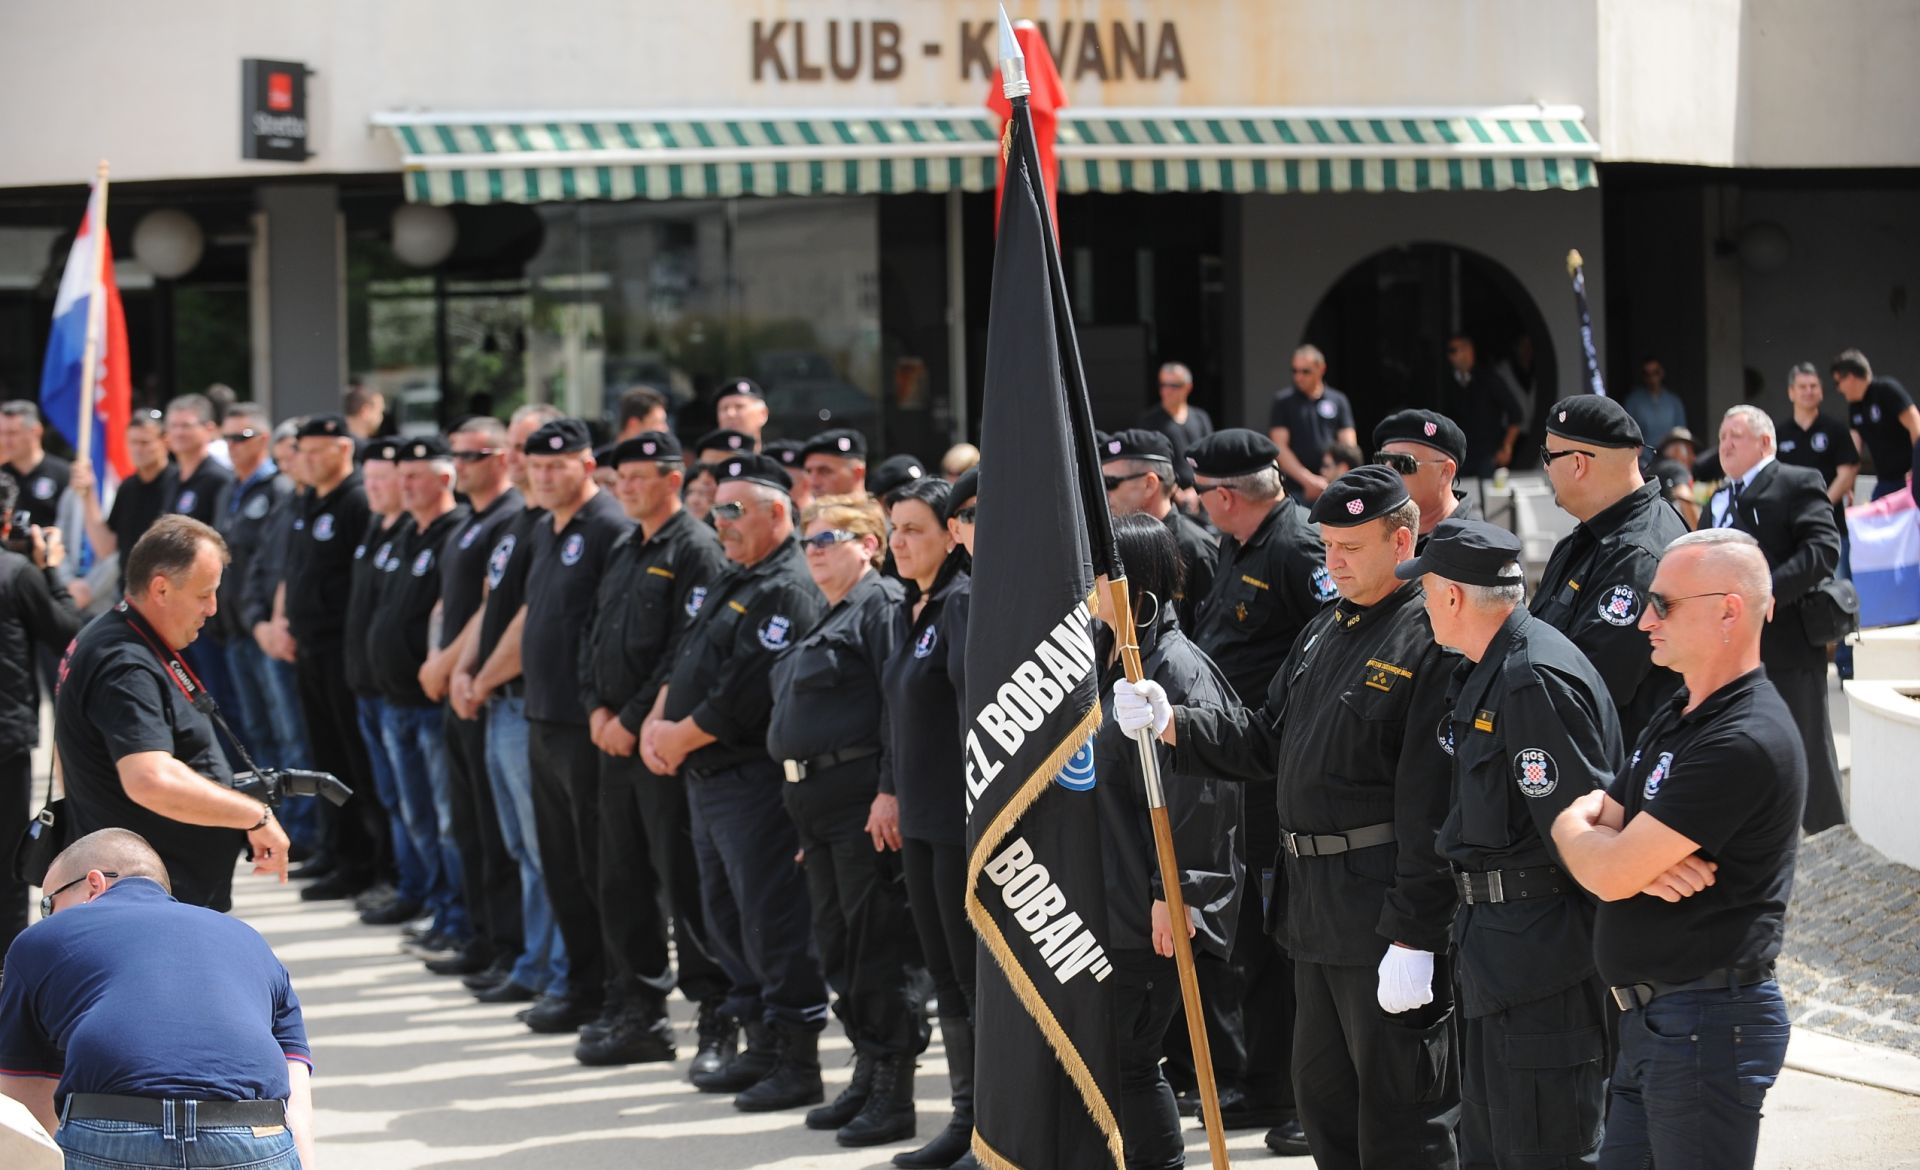 U Splitu obilježena 25. obljetnica utemeljenja IX. bojne HOS-a